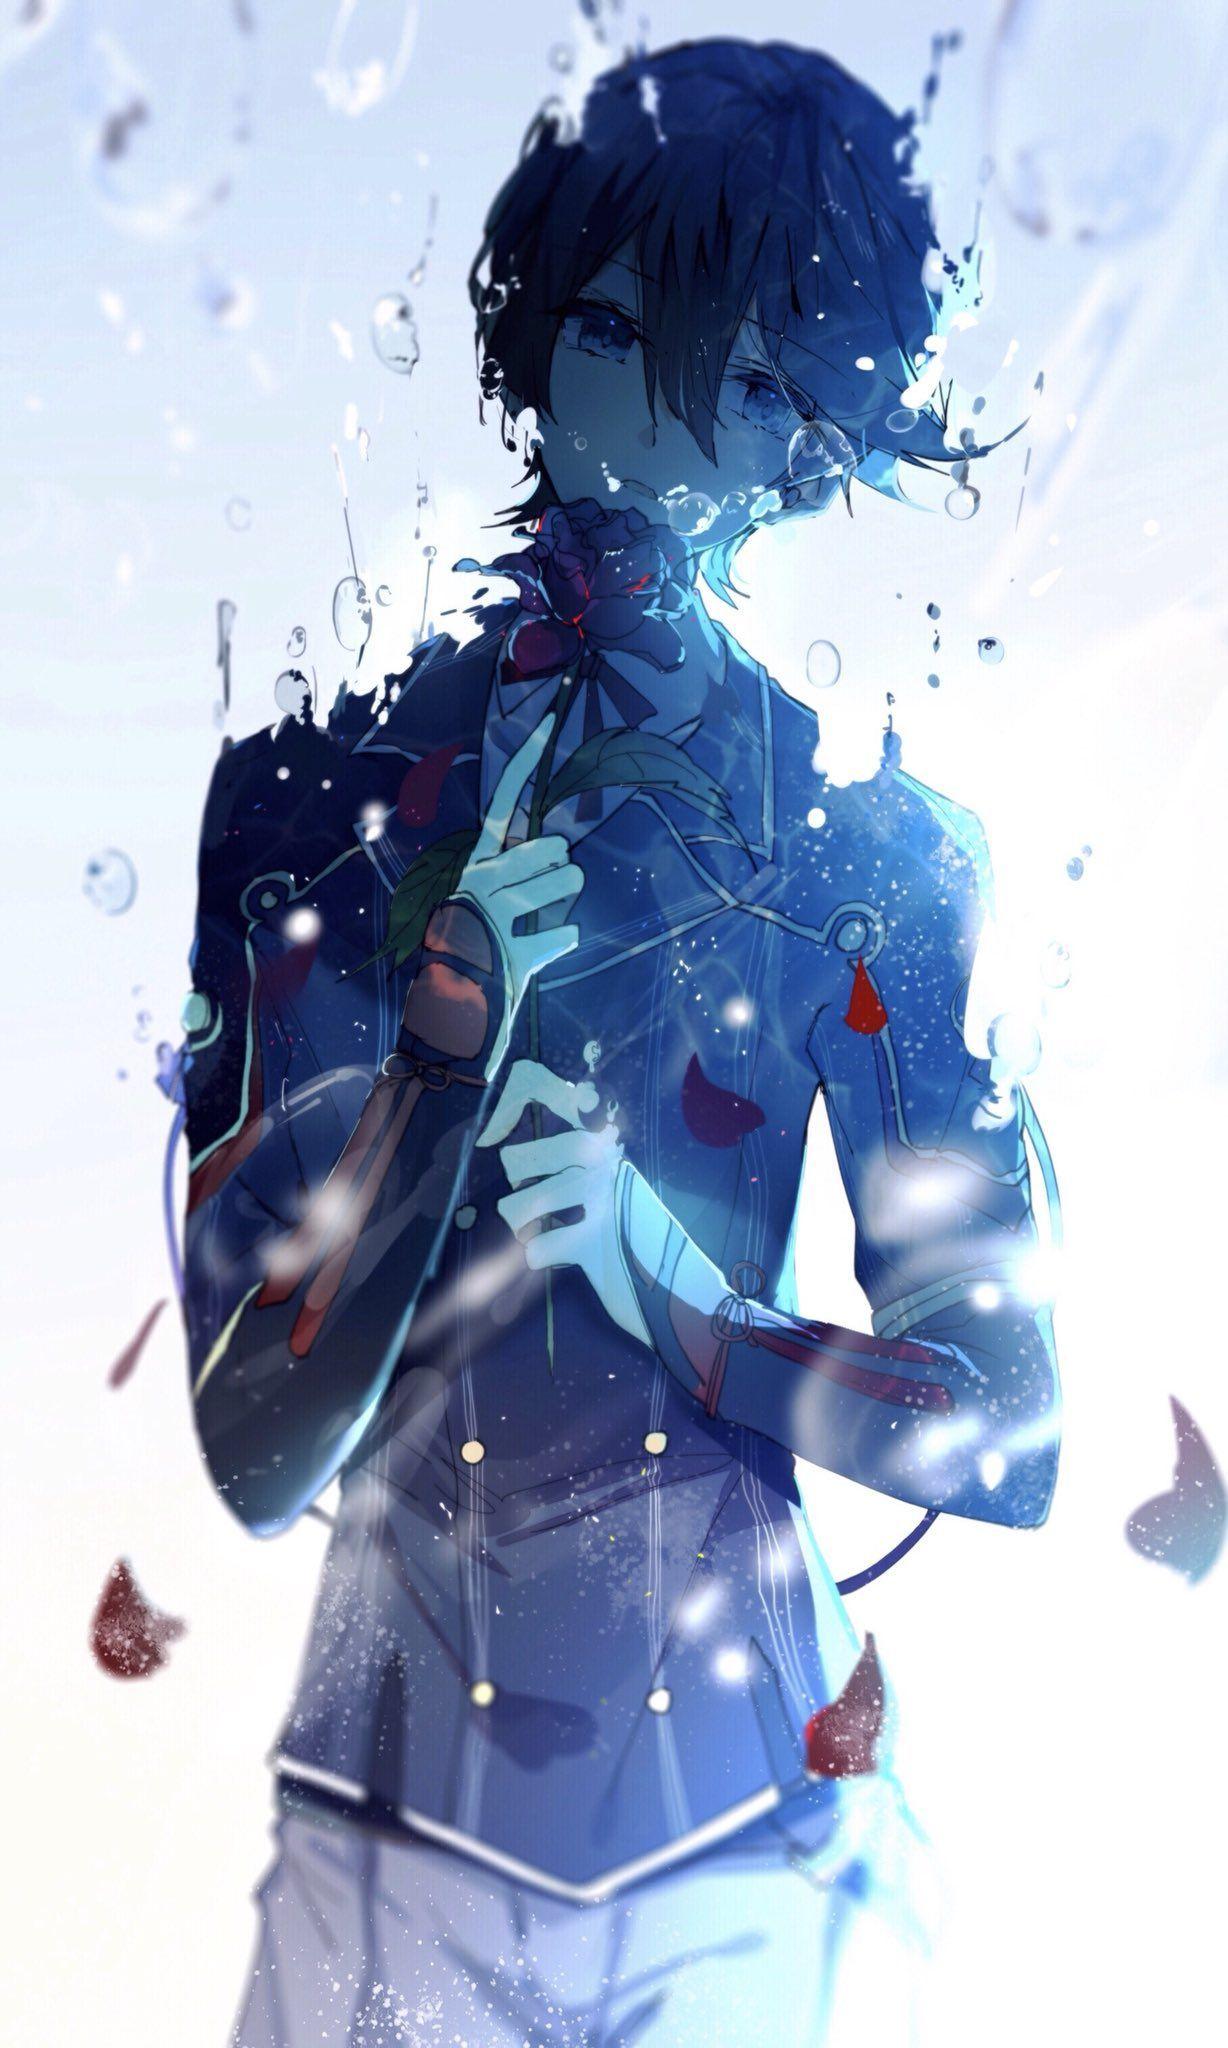 Epic Anime Pictures : anime, pictures, Anime, Wallpapers, Wallpaper